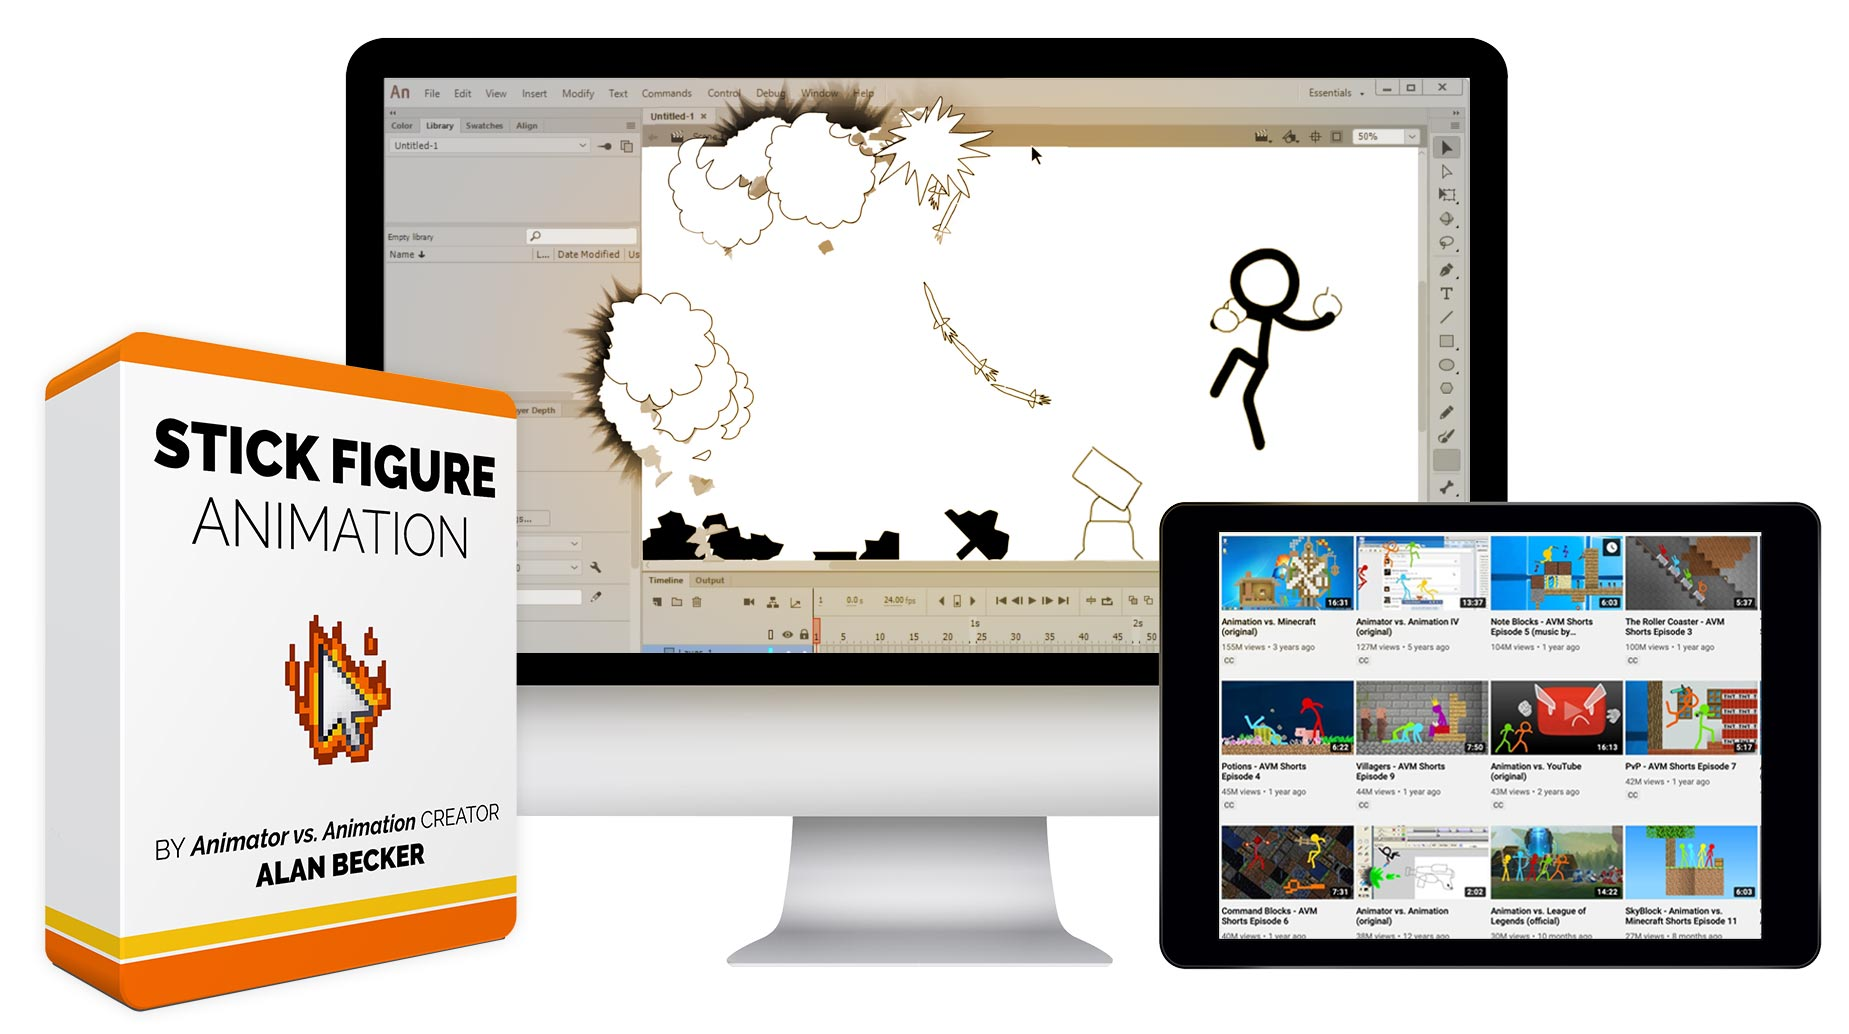 [VIP] Bloop Animation - Stick Figure Animation